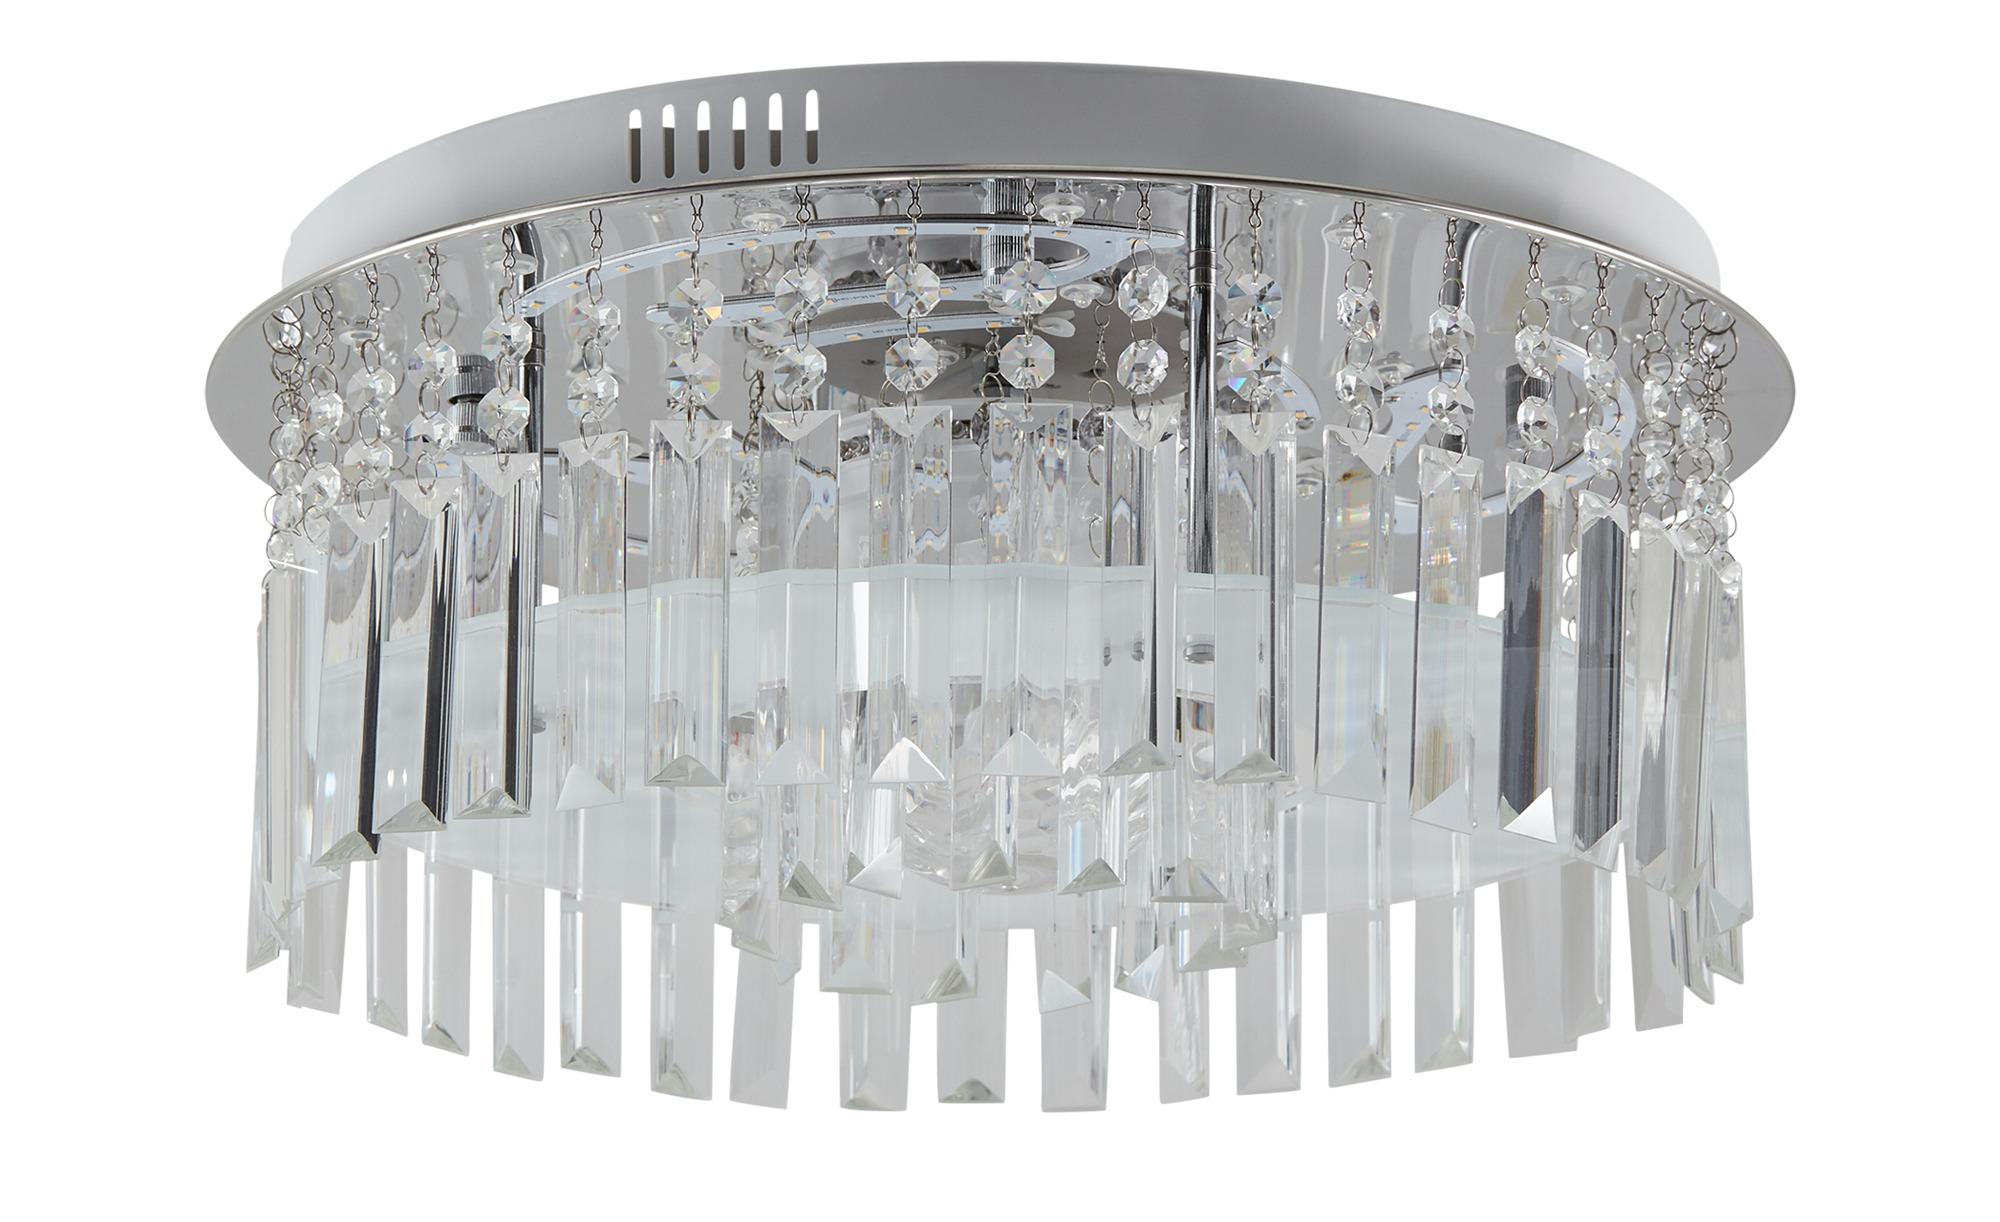 KHG LED Deckenleuchte mit Discokugel silber 25 cm Sconto